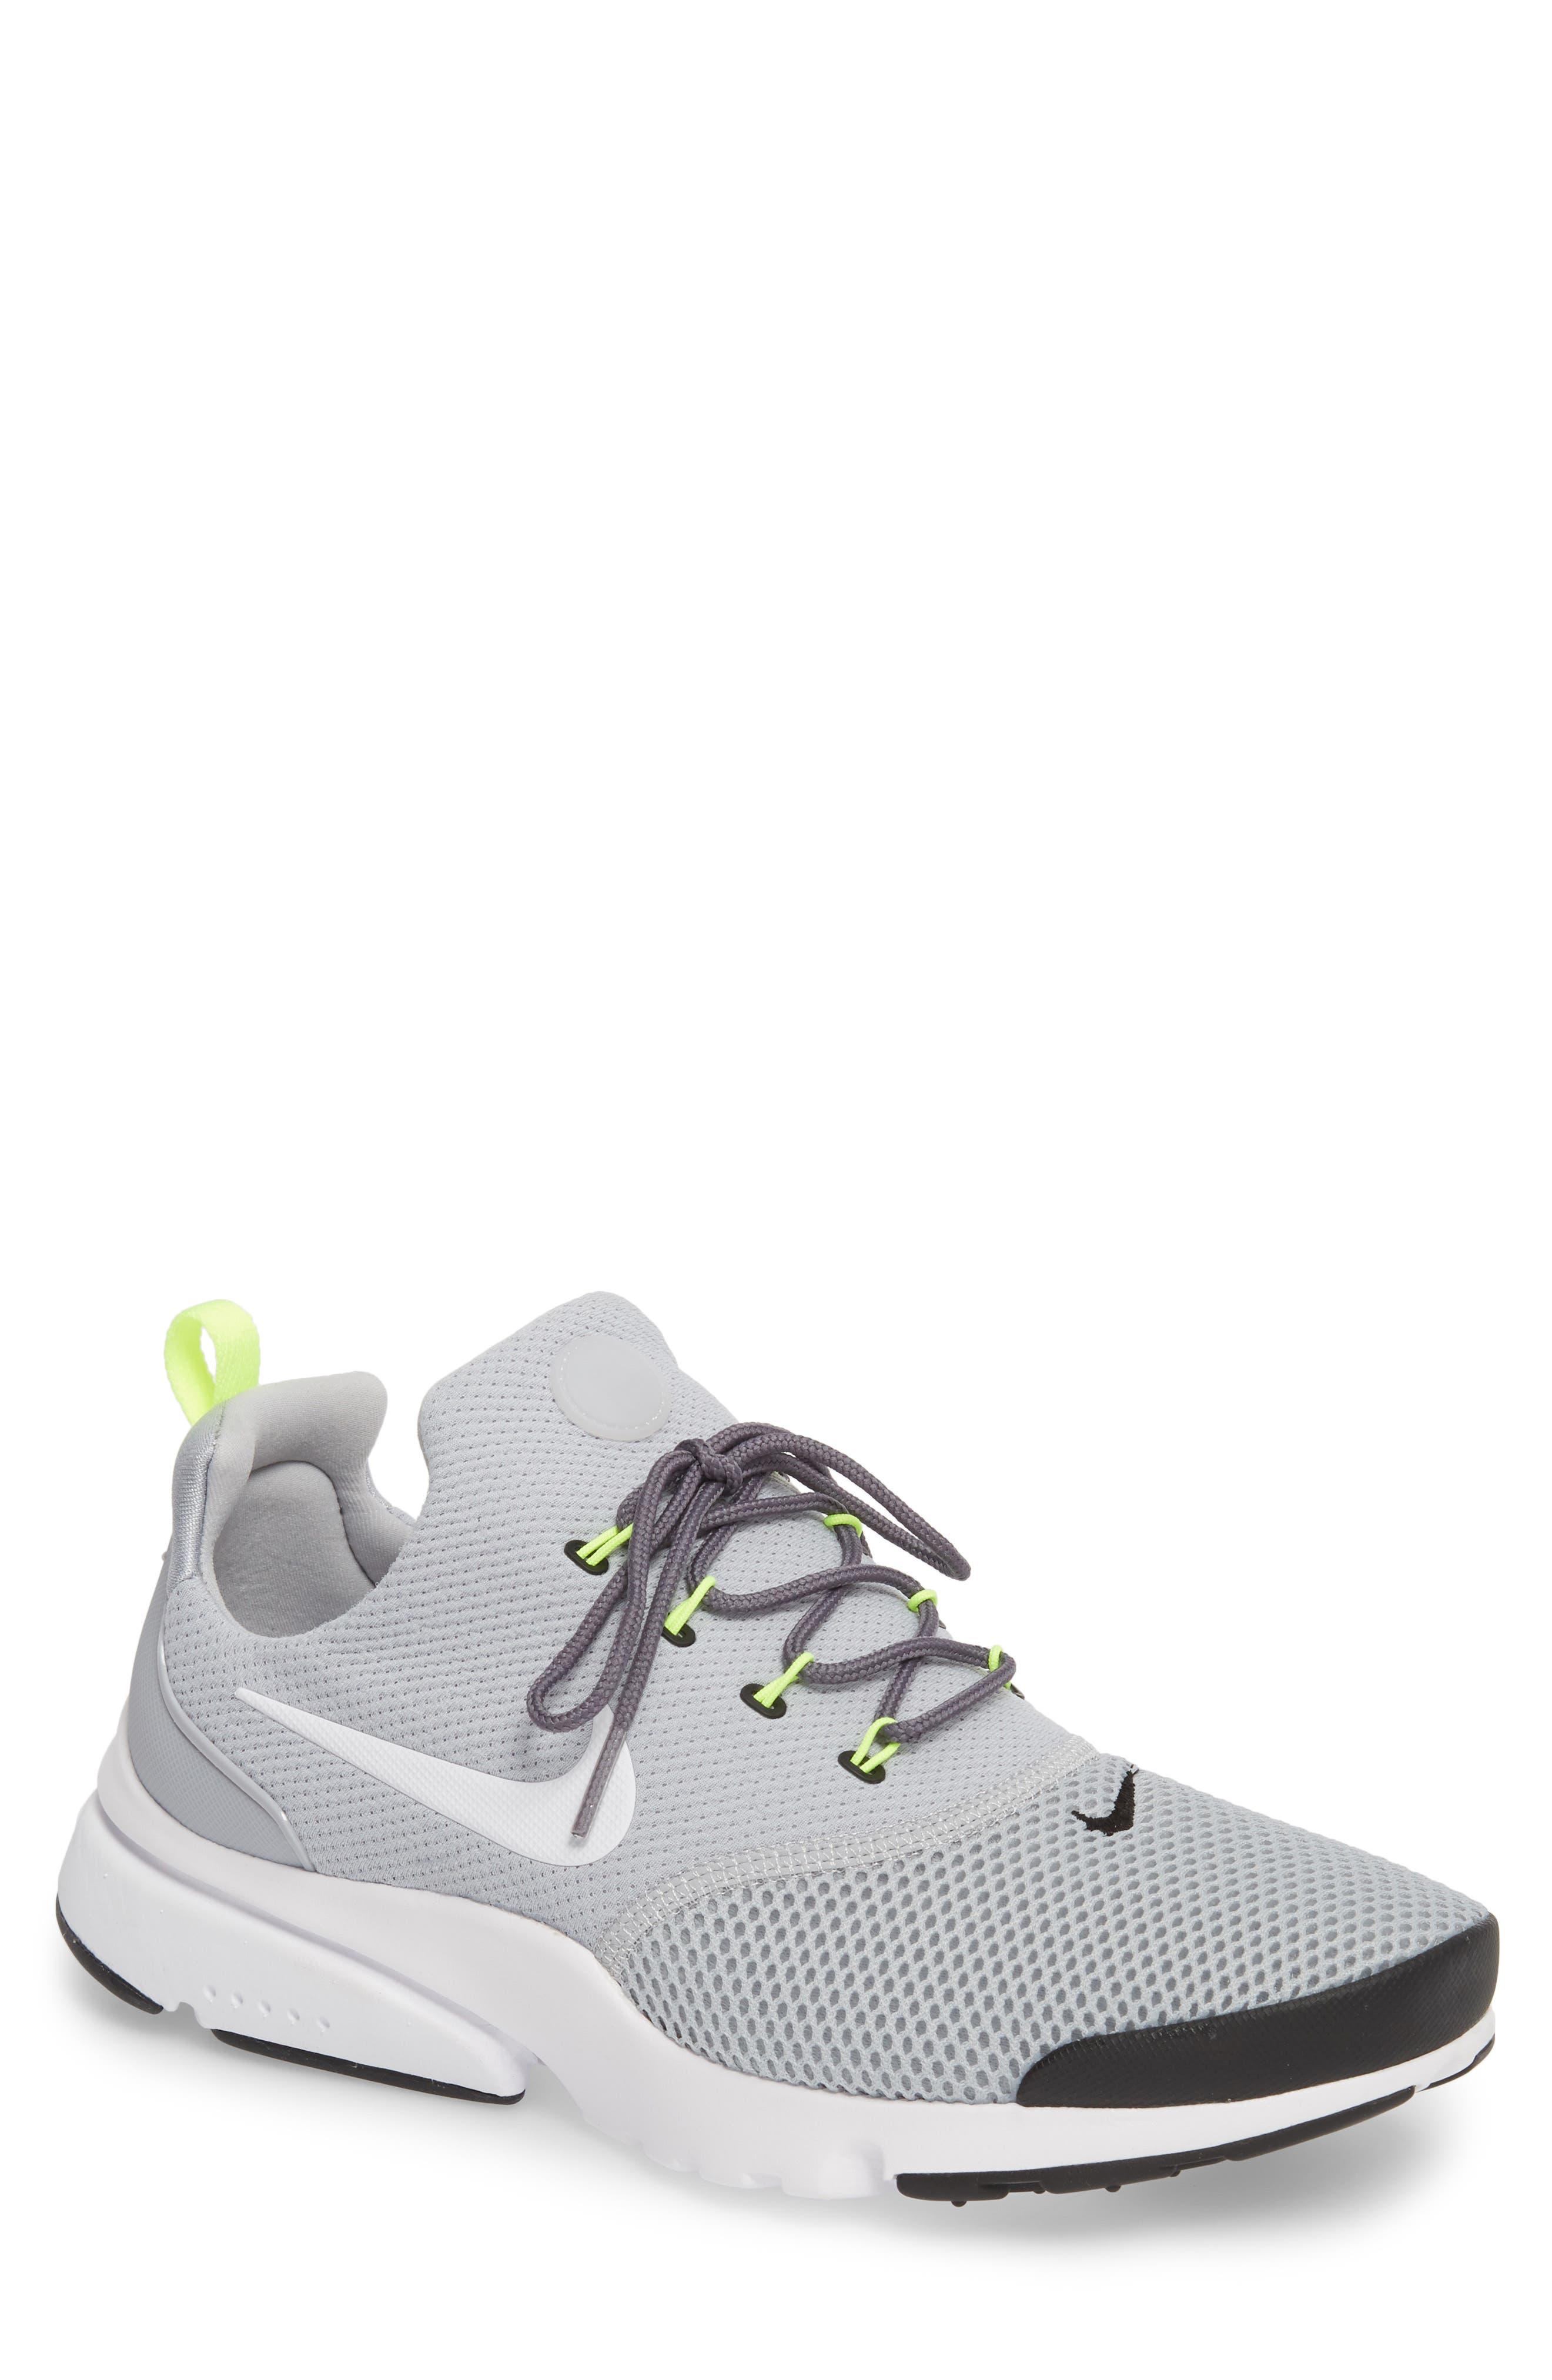 Presto Fly Sneaker,                             Main thumbnail 1, color,                             023